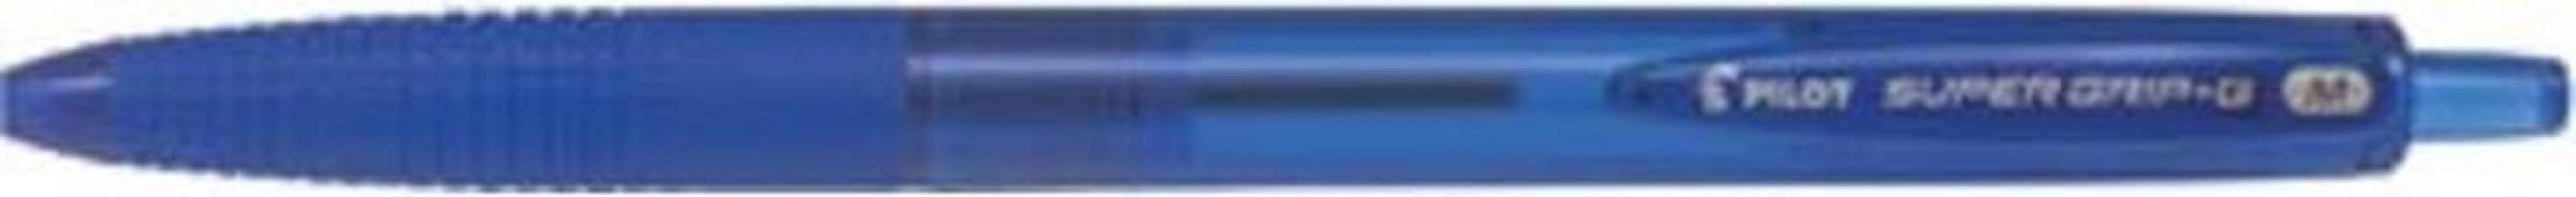 , Balpen PILOT Supergrip G blauw 0.32mm valueapack à 24+6 stuks